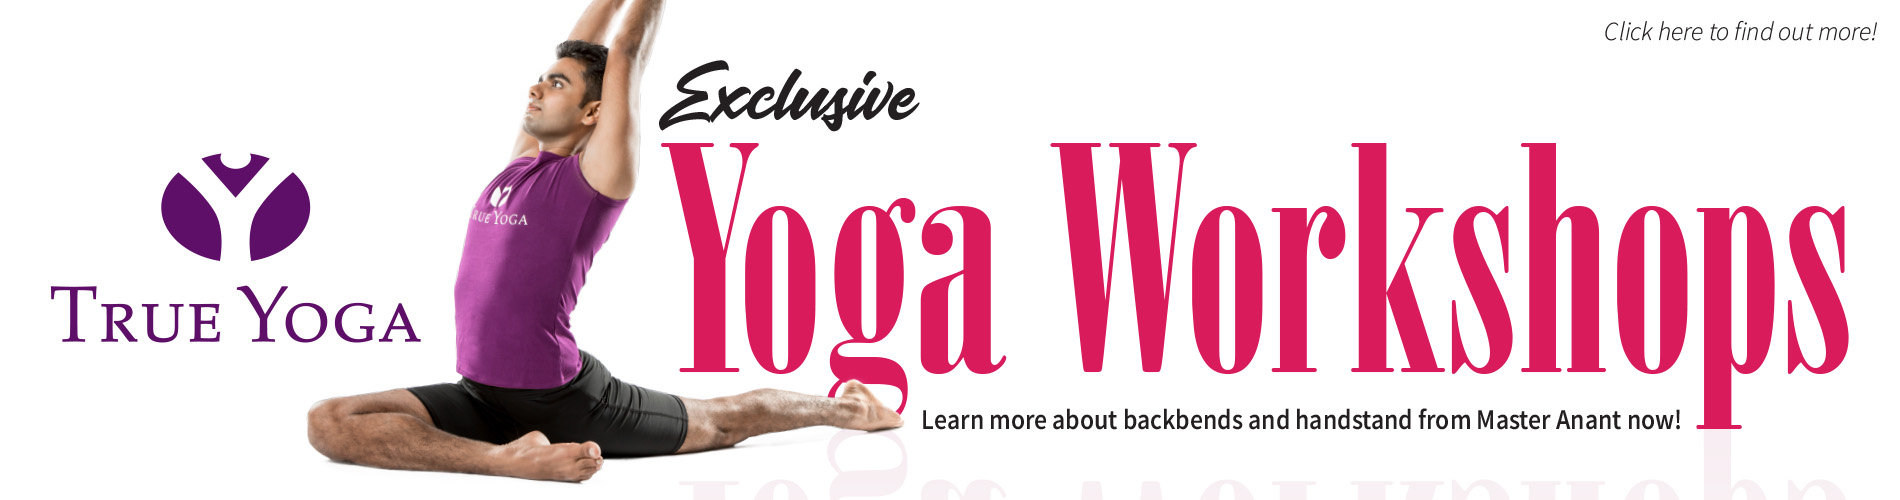 Master Anant Yoga Workshop